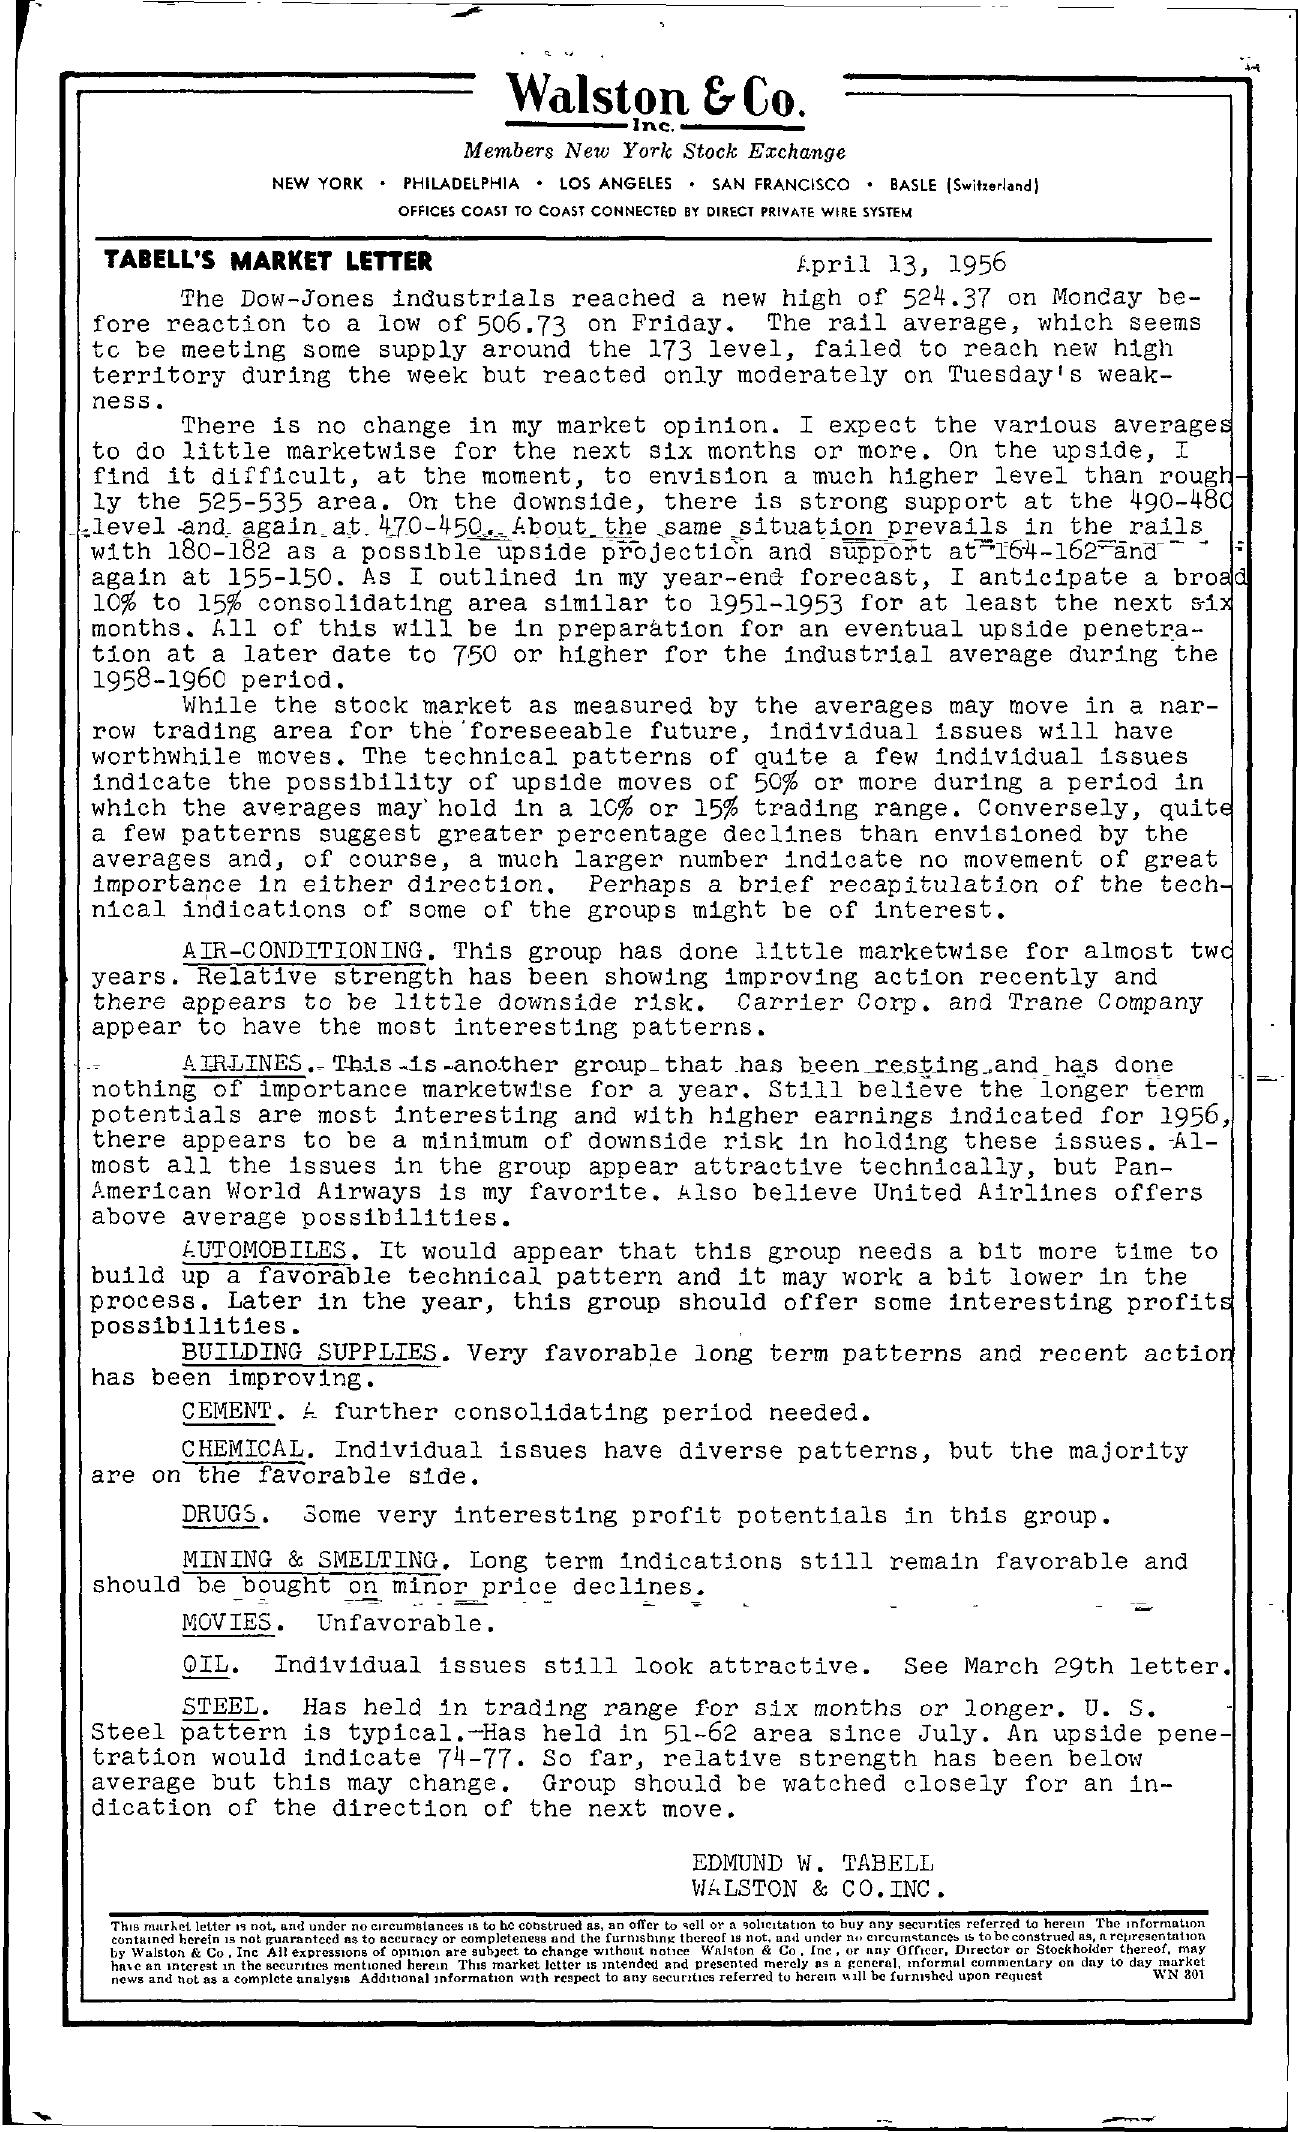 Tabell's Market Letter - April 13, 1956